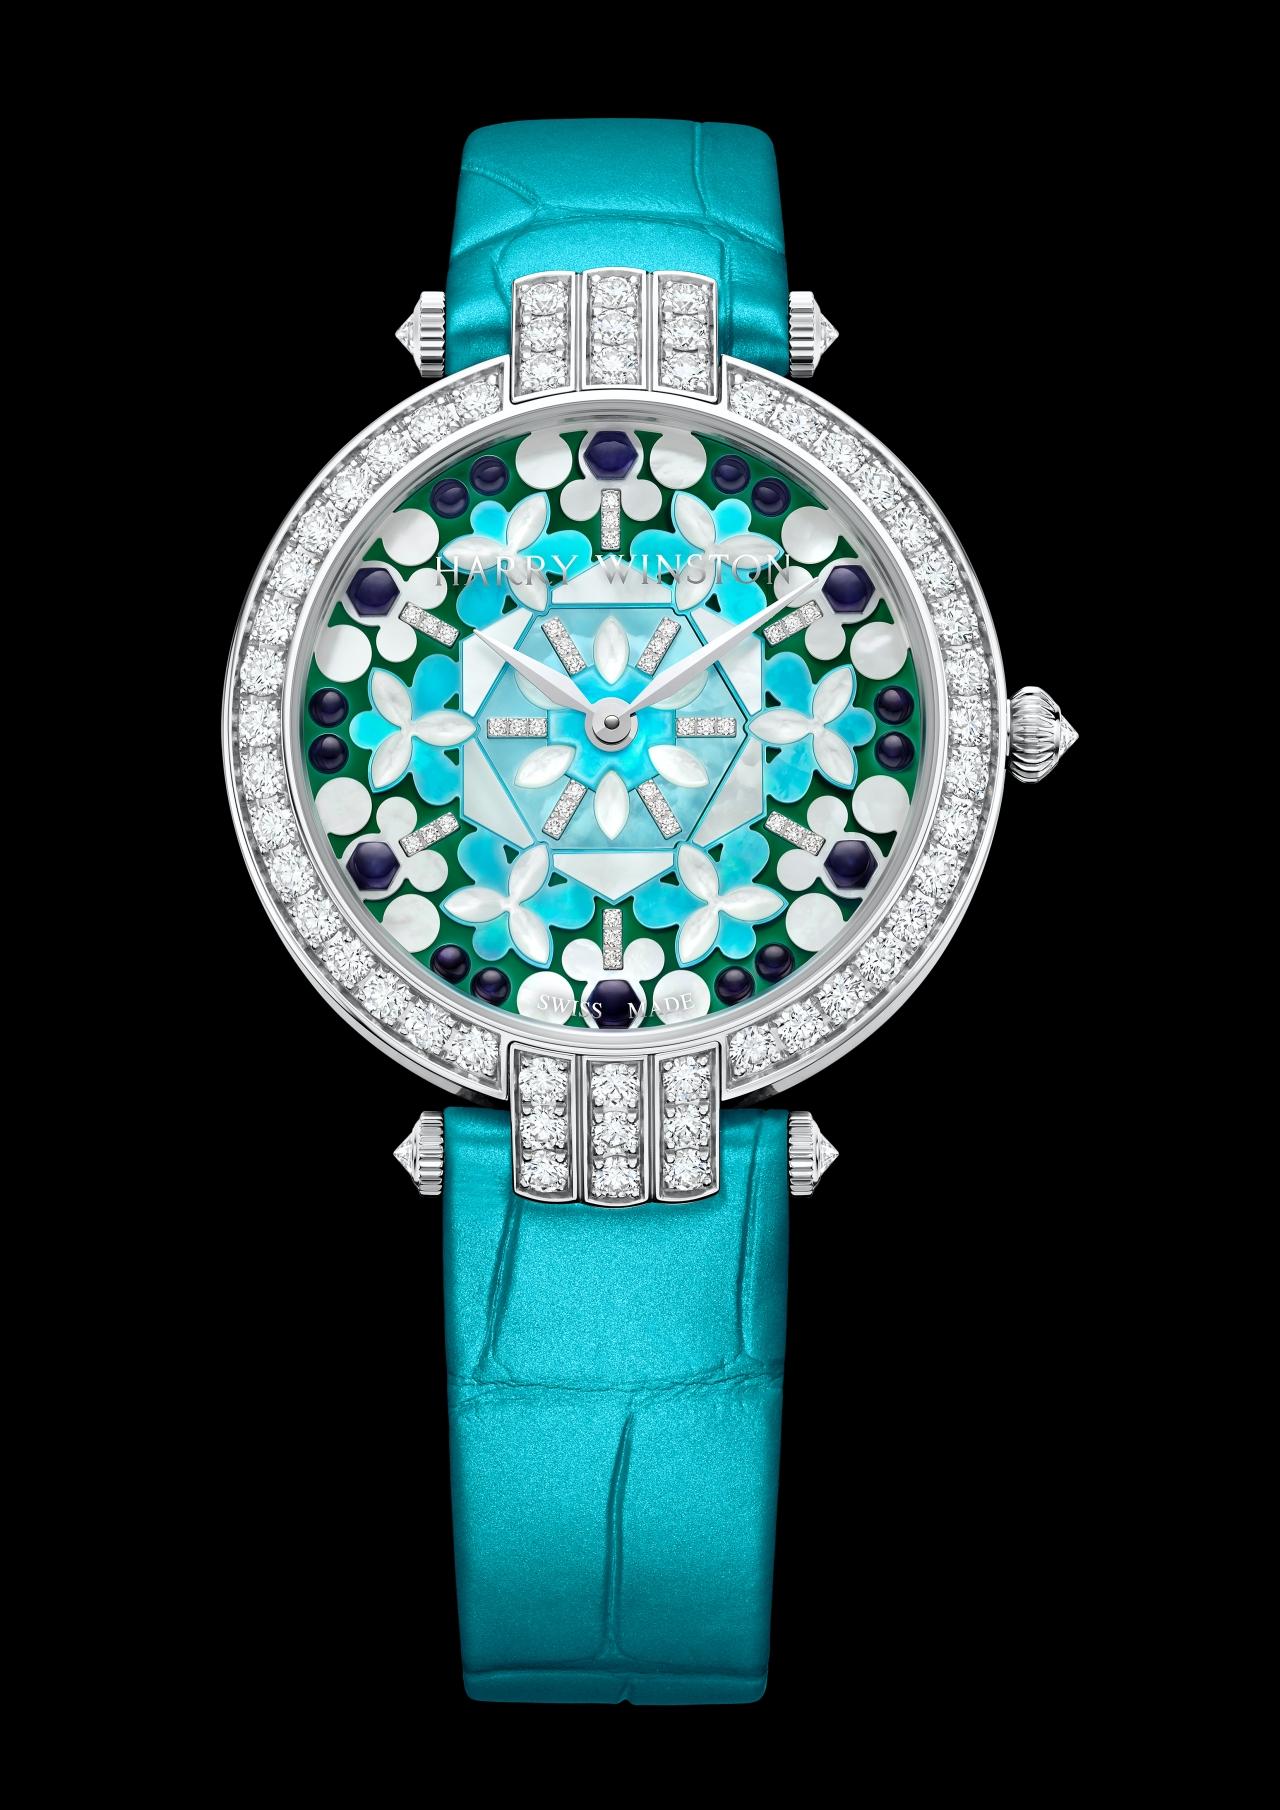 WATCH THIS|四款海瑞溫斯頓的萬花筒腕錶